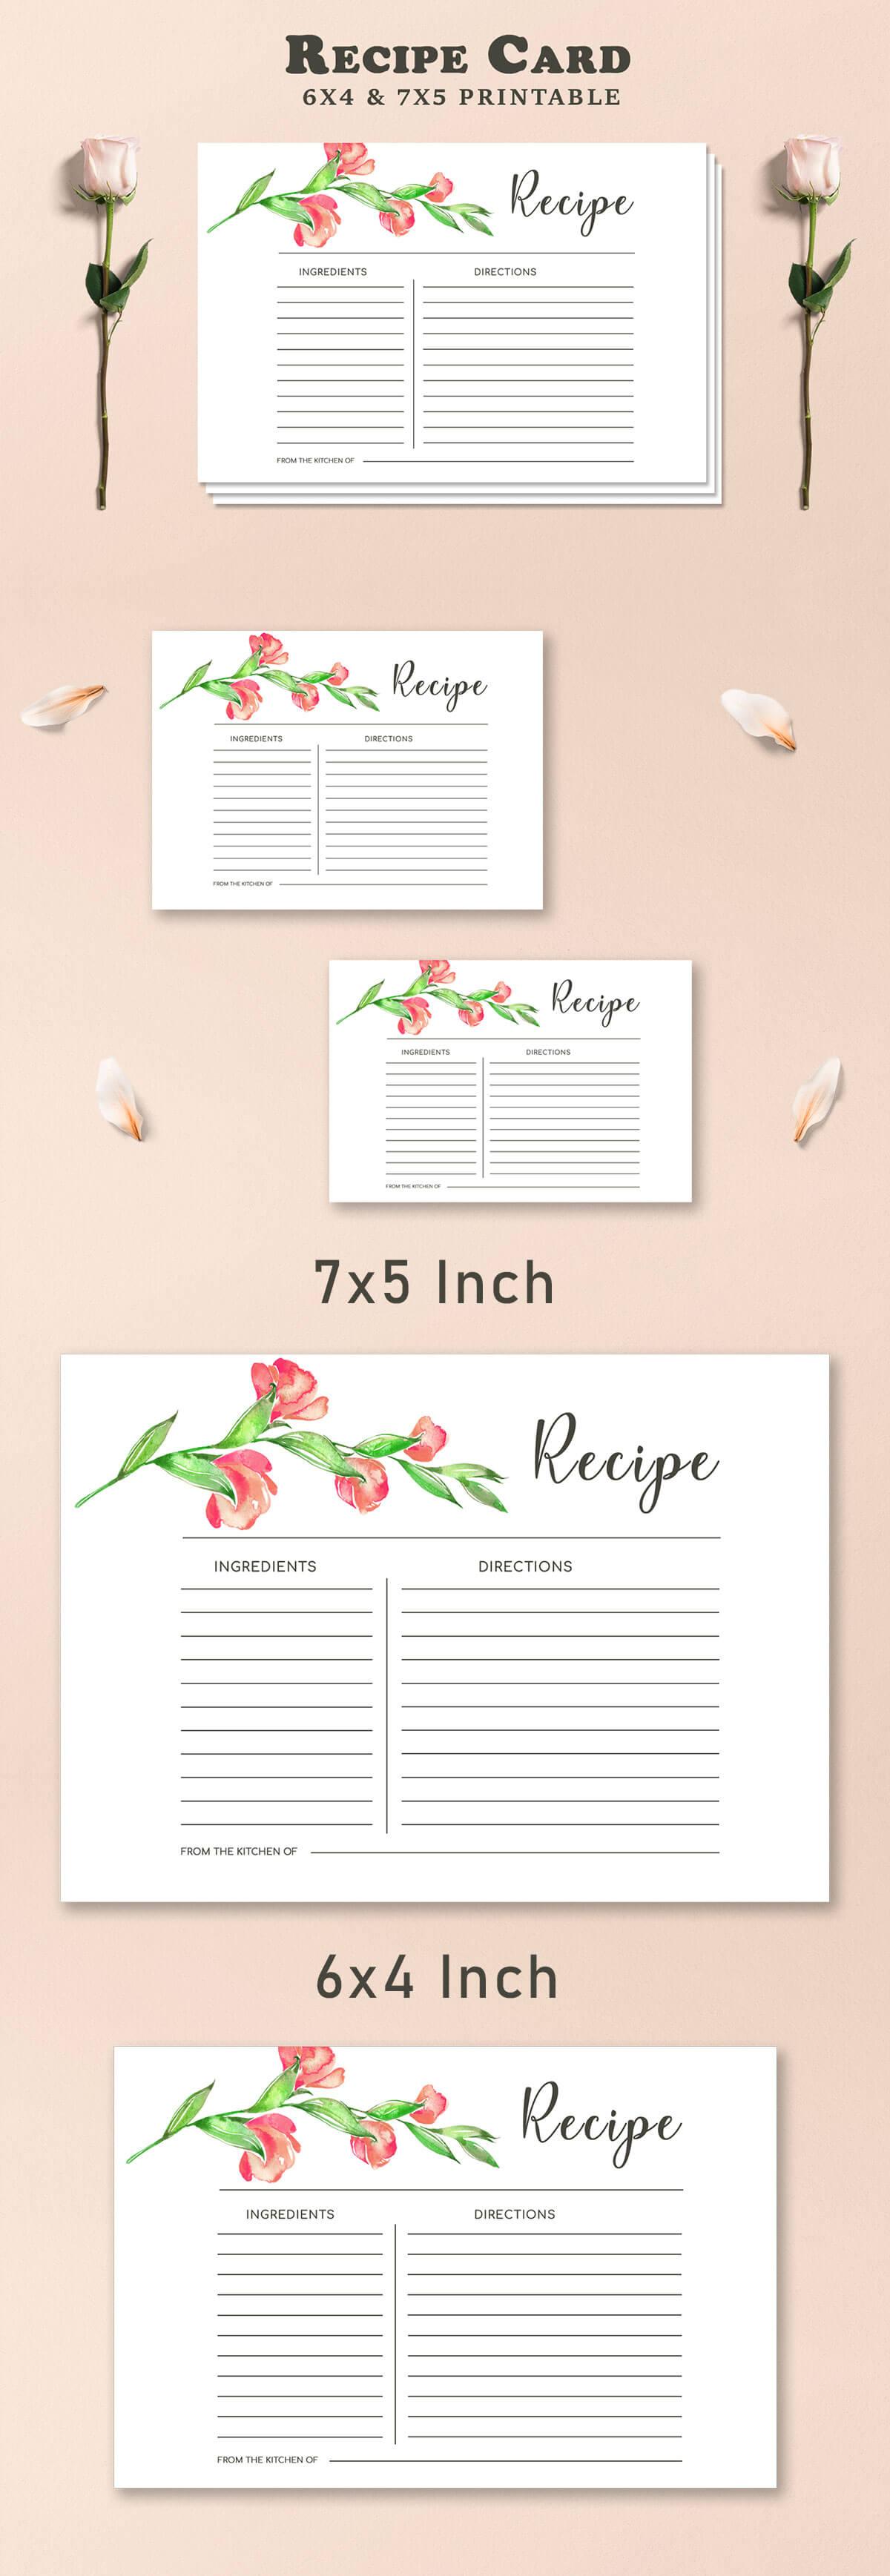 Free Recipe Card Printable Template V2